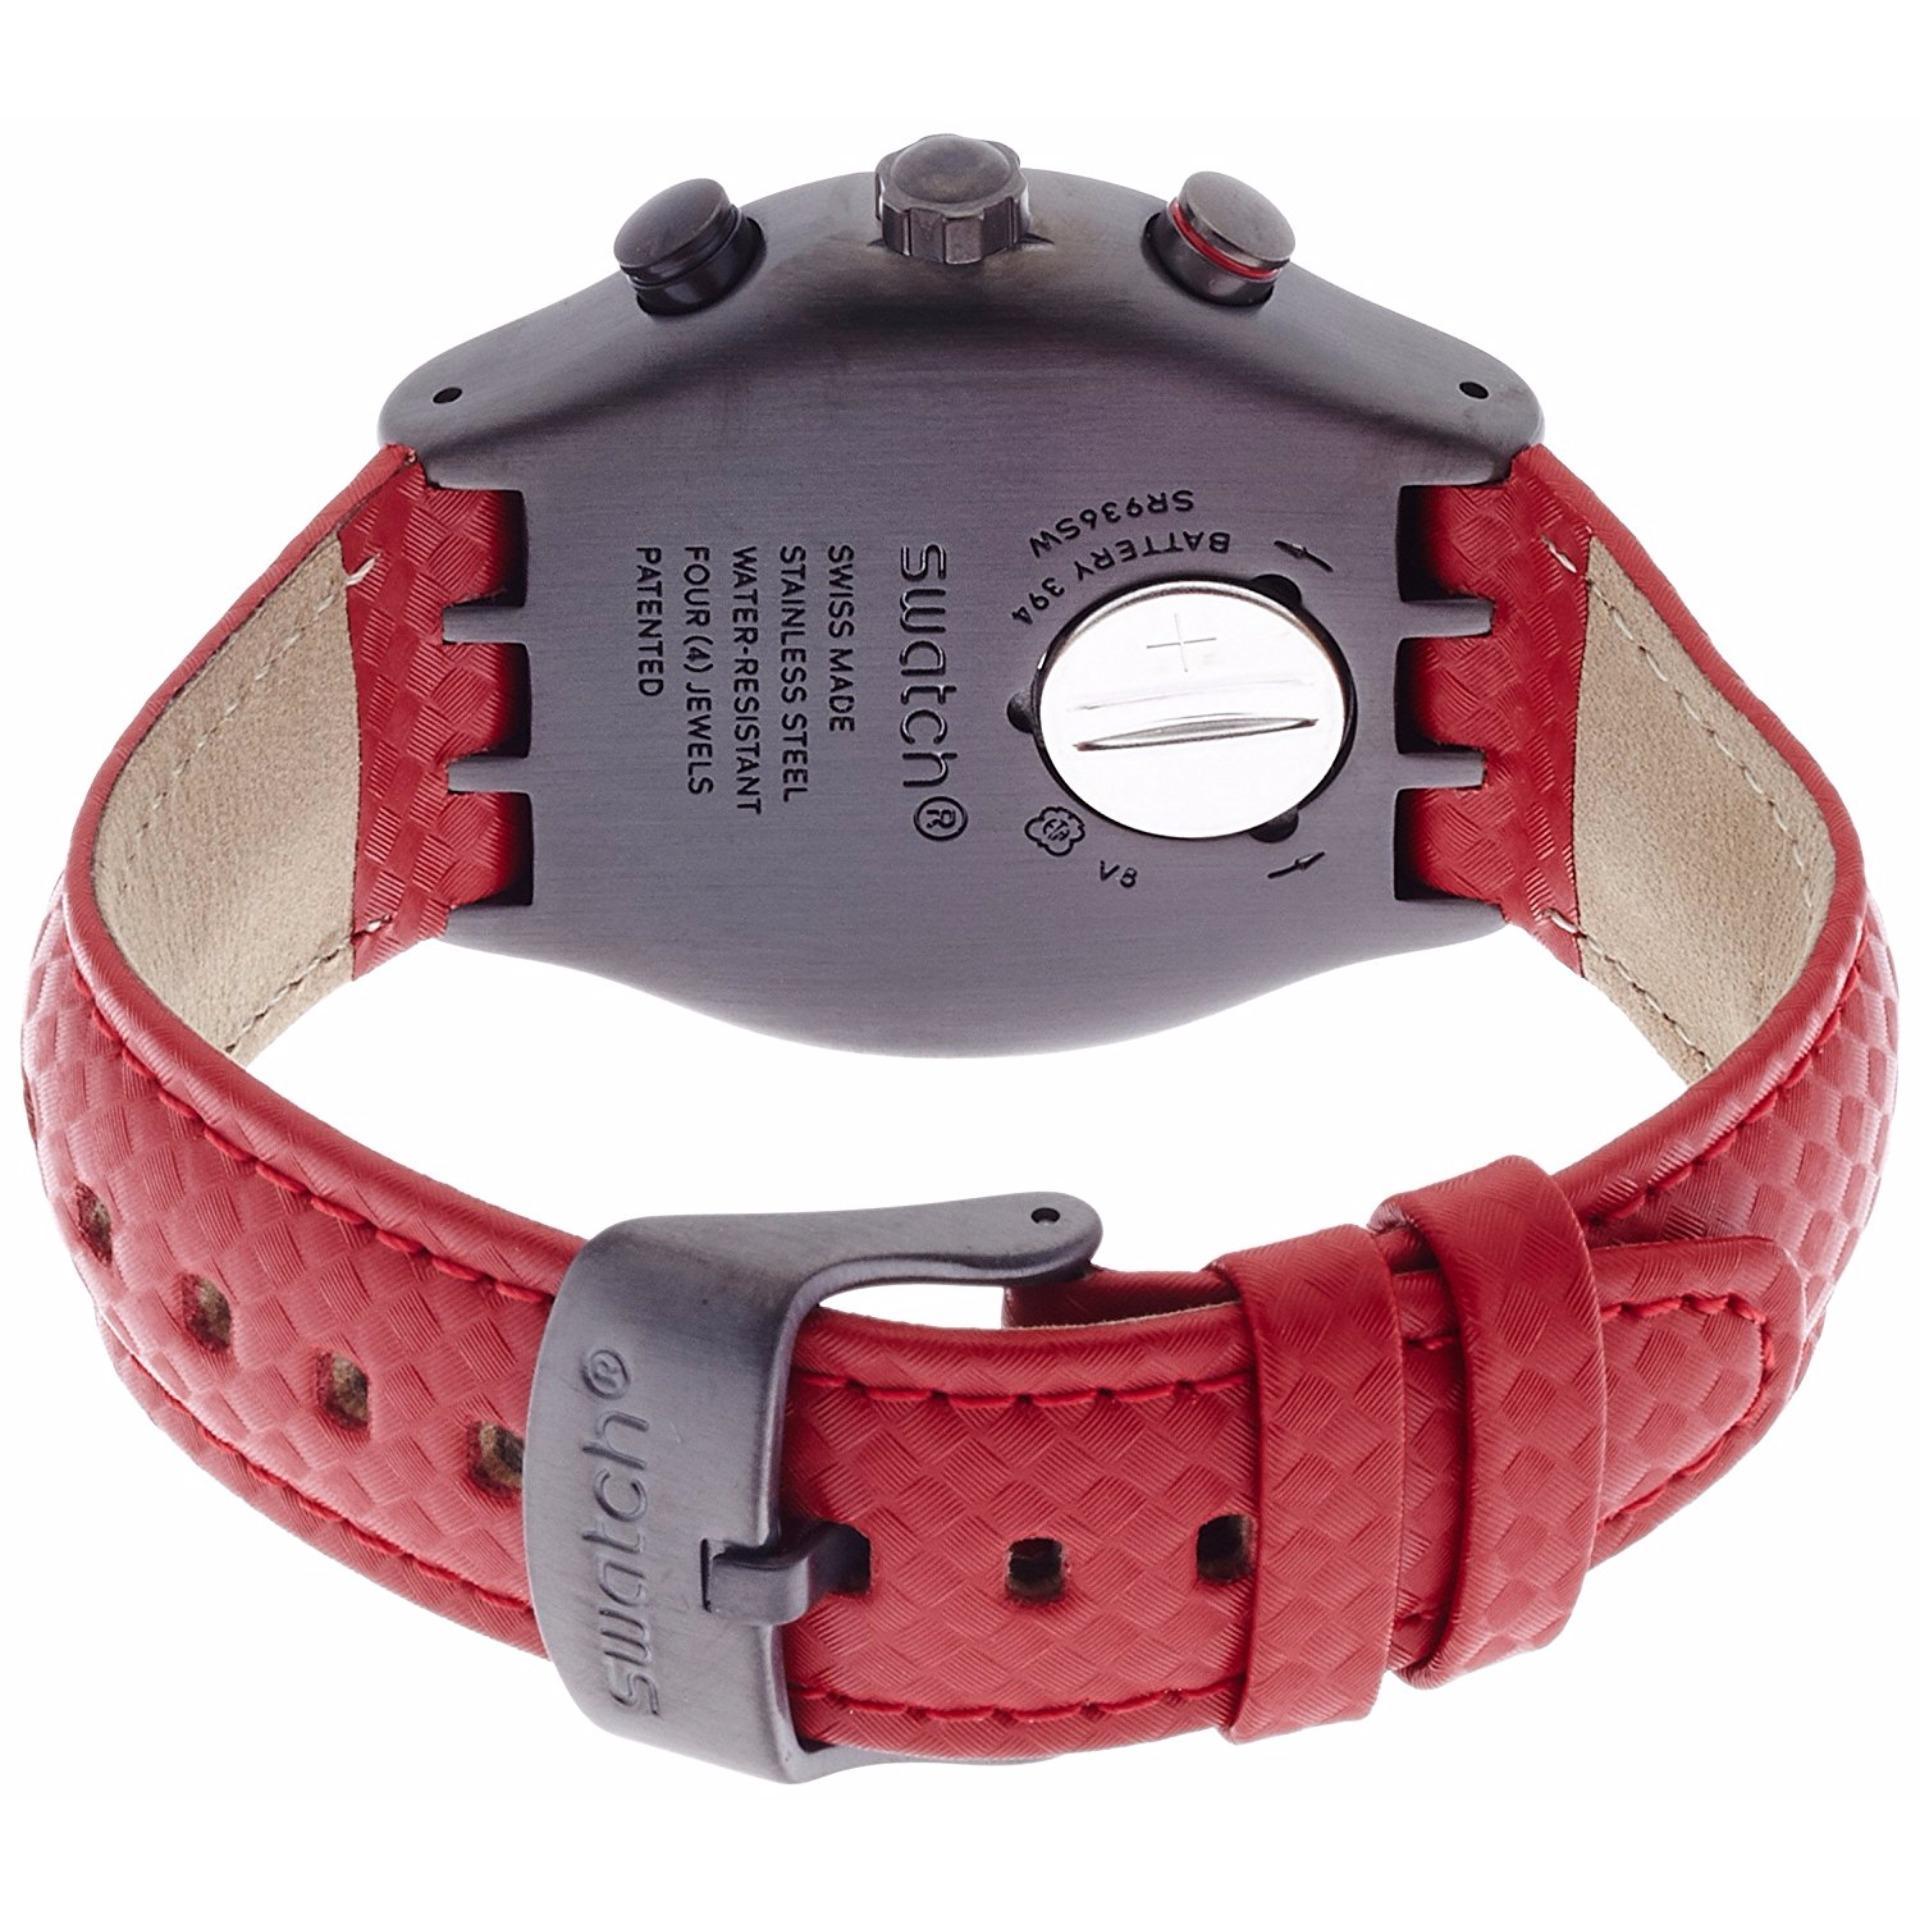 Fossil Ch2891 Coachman Chronograph Tachymeter Jam Tangan Pria Bahan Original Swatch Yvs431 Destination Roma Yvm401 Rosso Fuoco Tanganpria